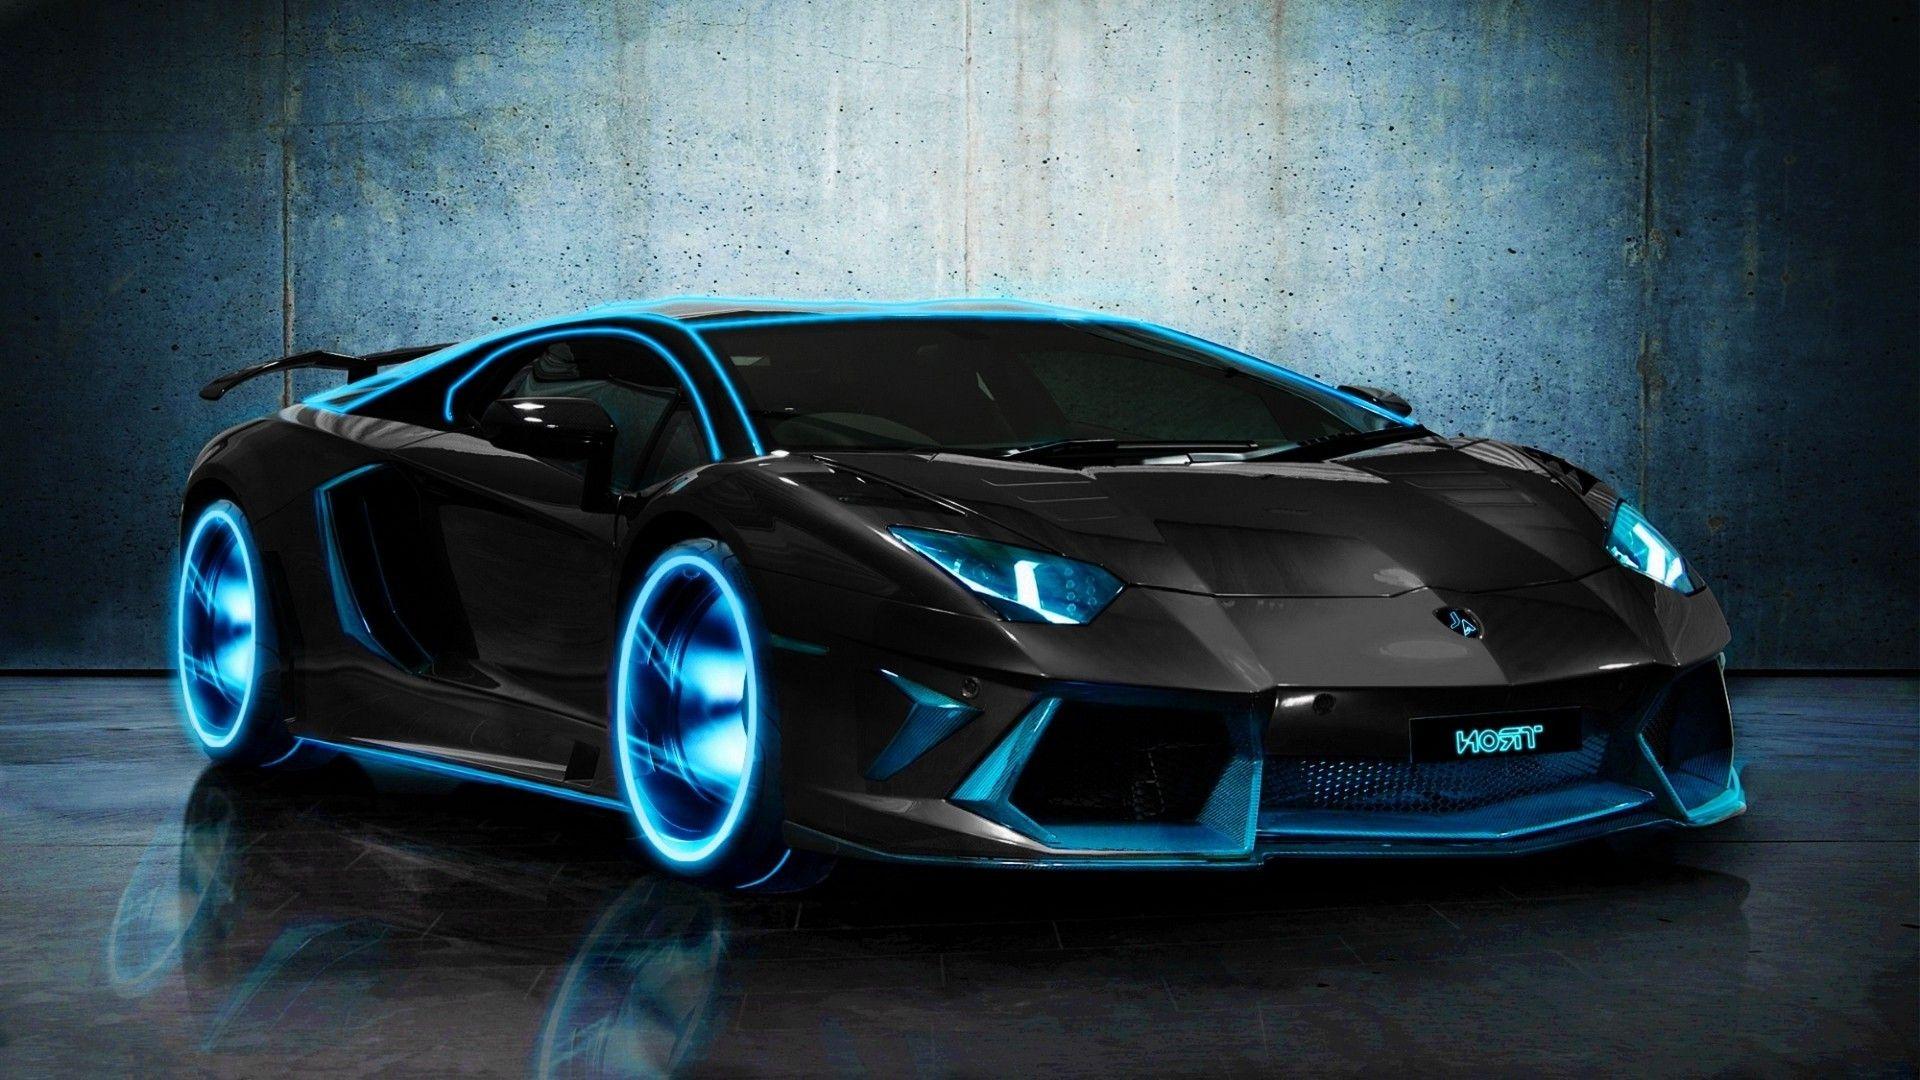 amazing cars lamborghini aventador and nice cars on pinterest unique black and blue - Lamborghini Black And Blue